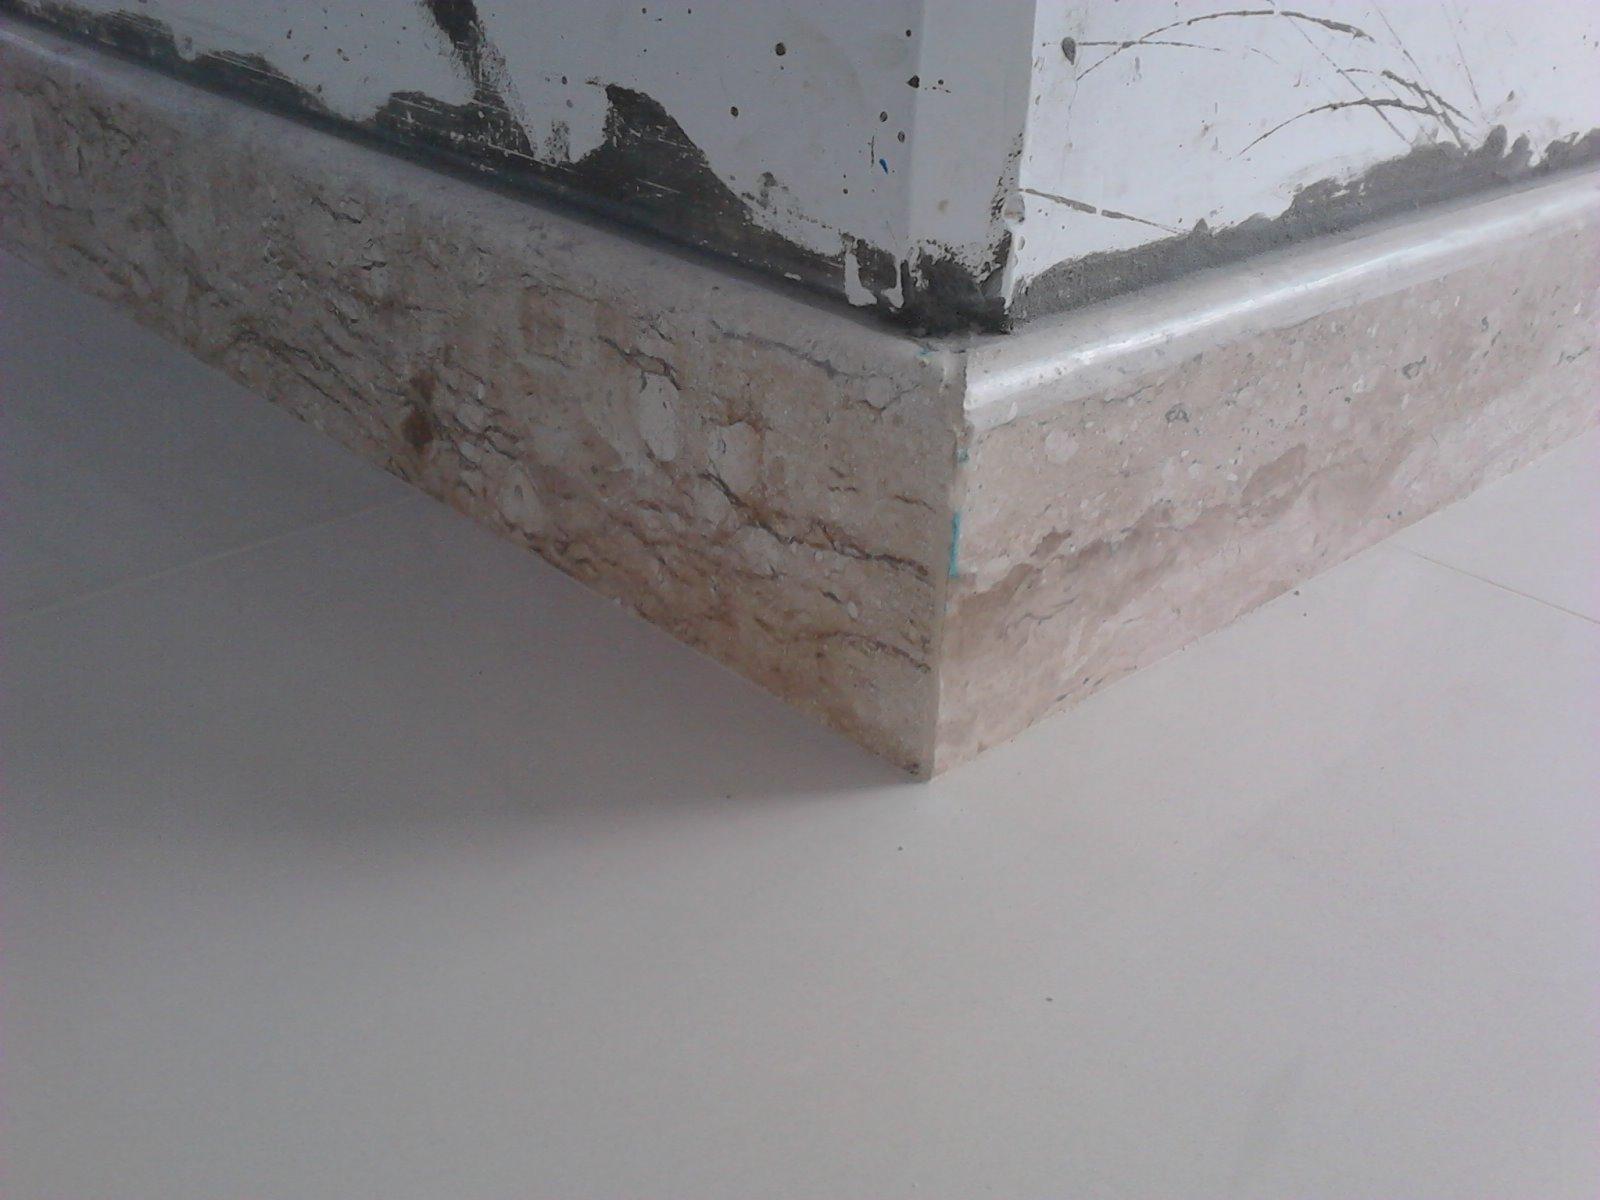 Casa nova marmores e granitos a qualidade faz toda a for Tipos de granito para mesada